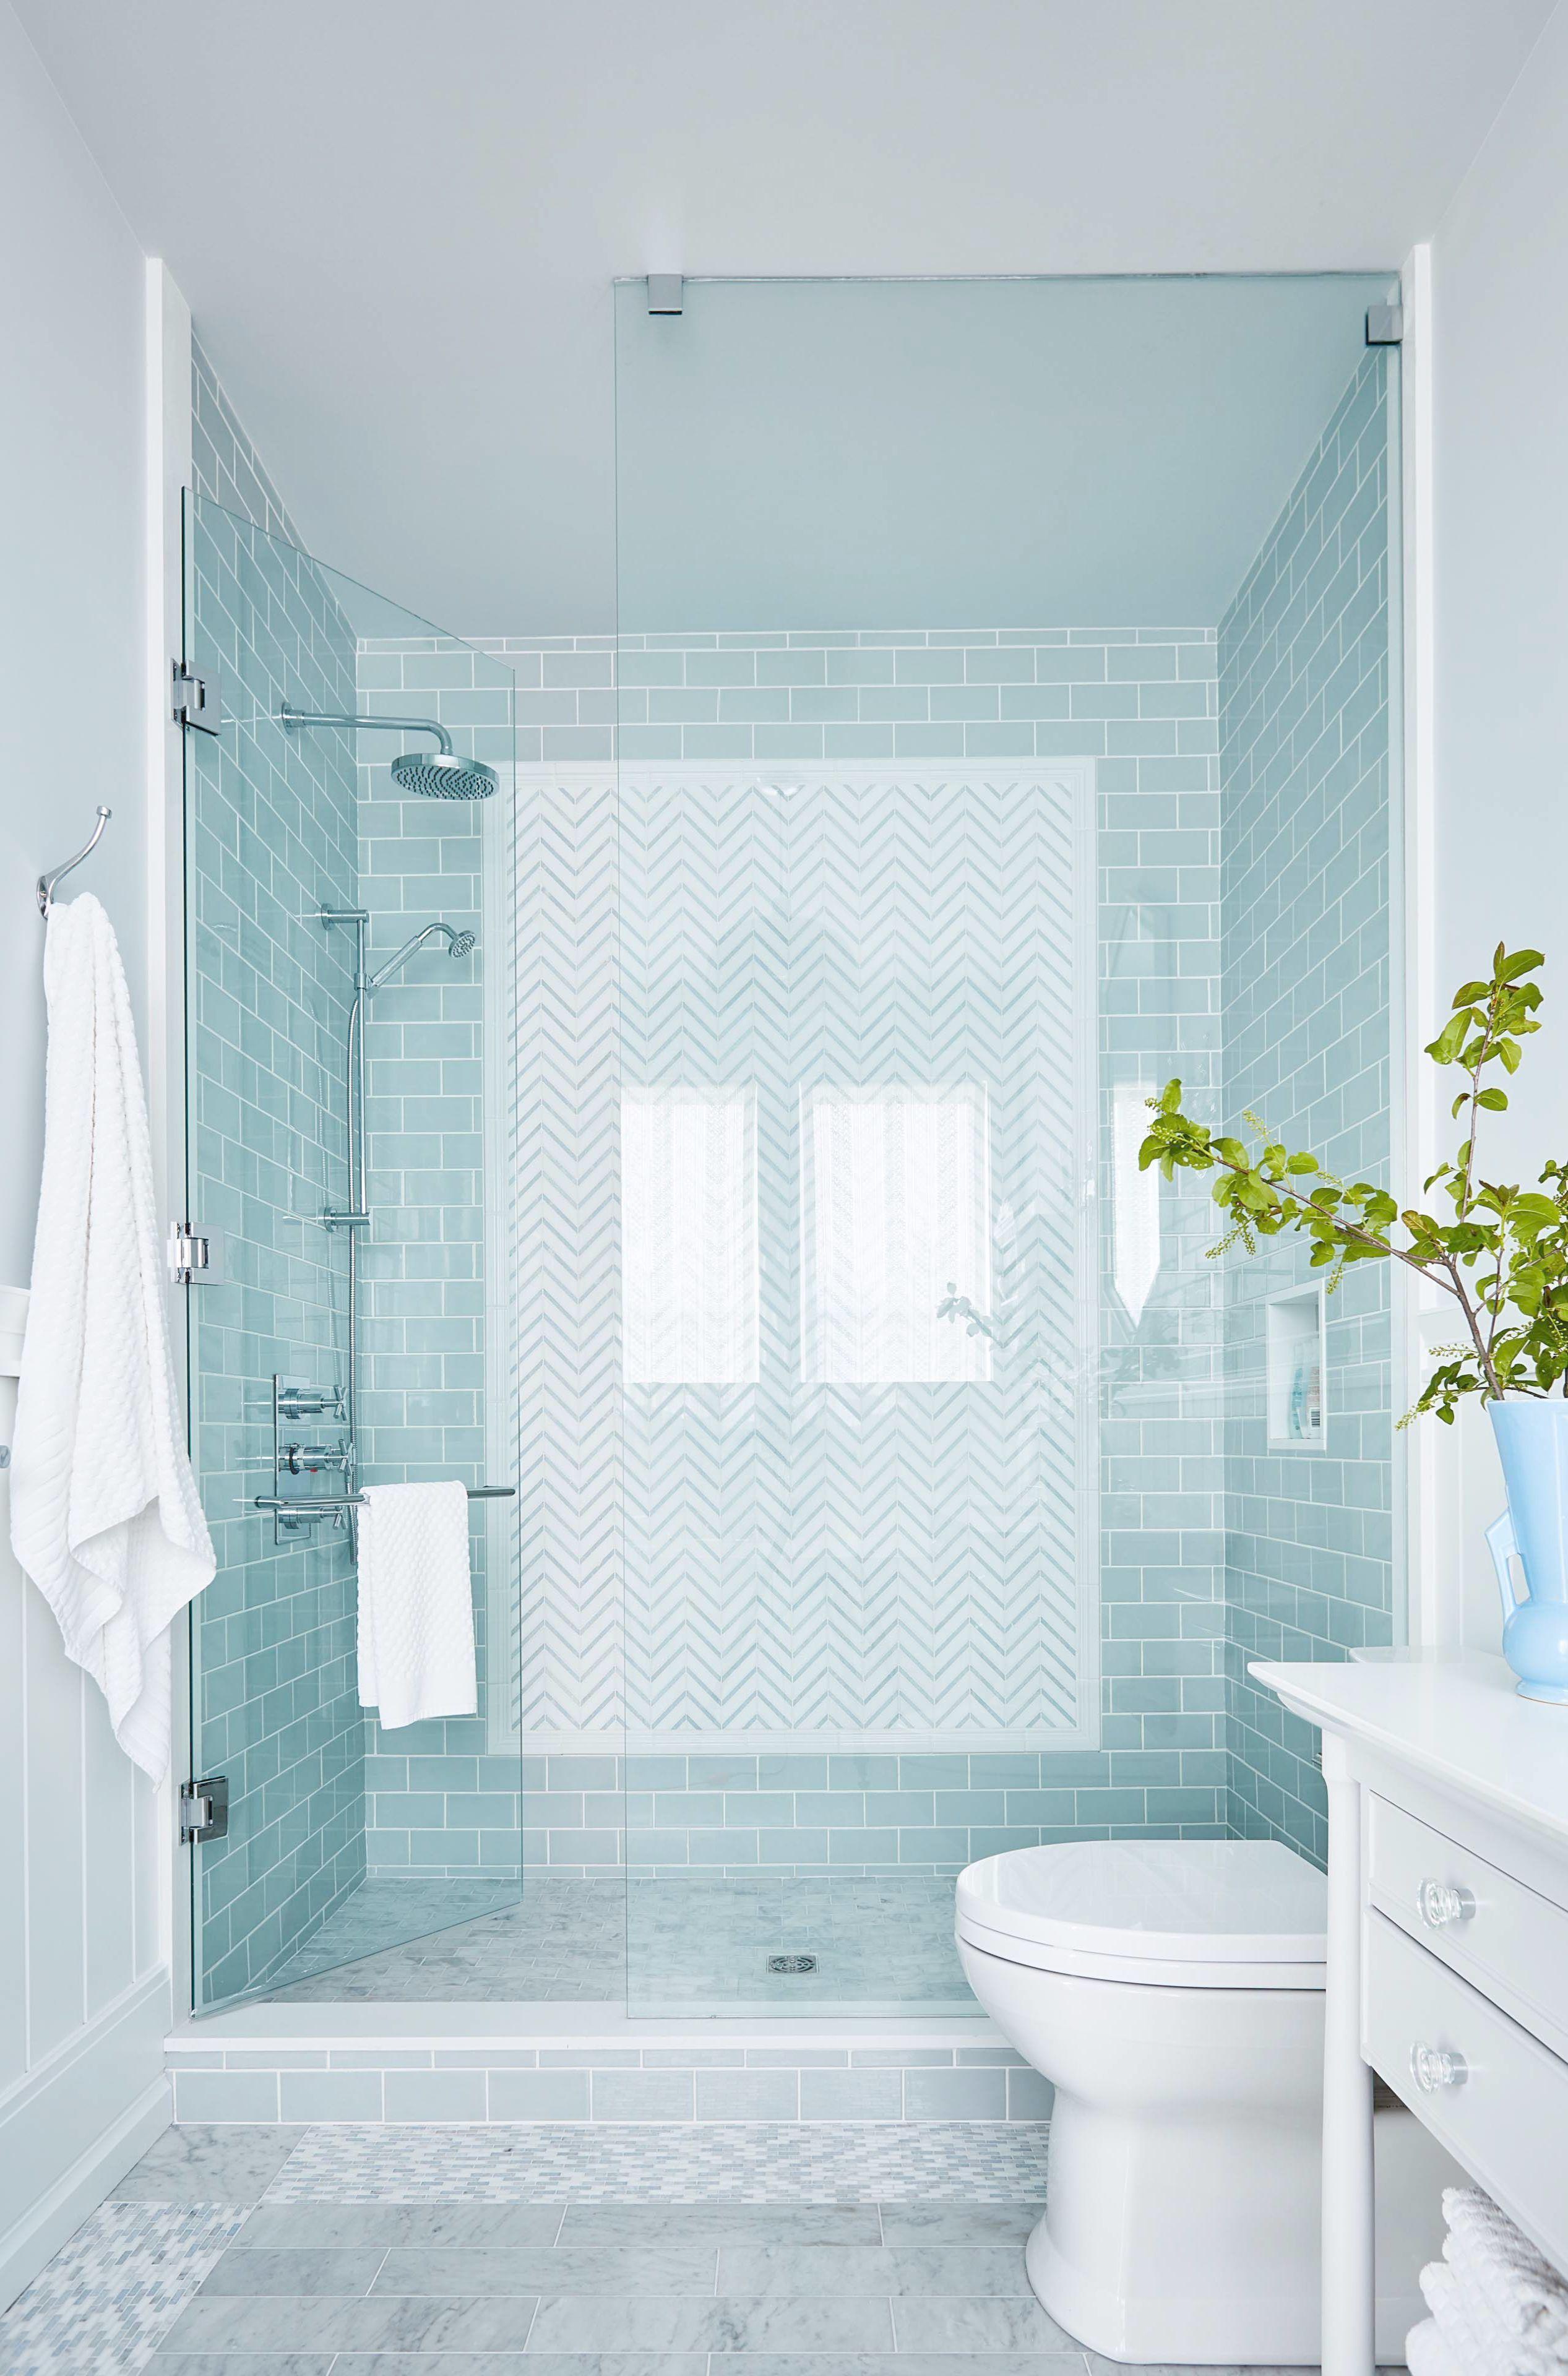 Bathroom Tile Ideas Green On Bathroom Light Fixtures Beach Theme Bathroom Tile Designs Bathroom Remodel Master Simple Bathroom Designs